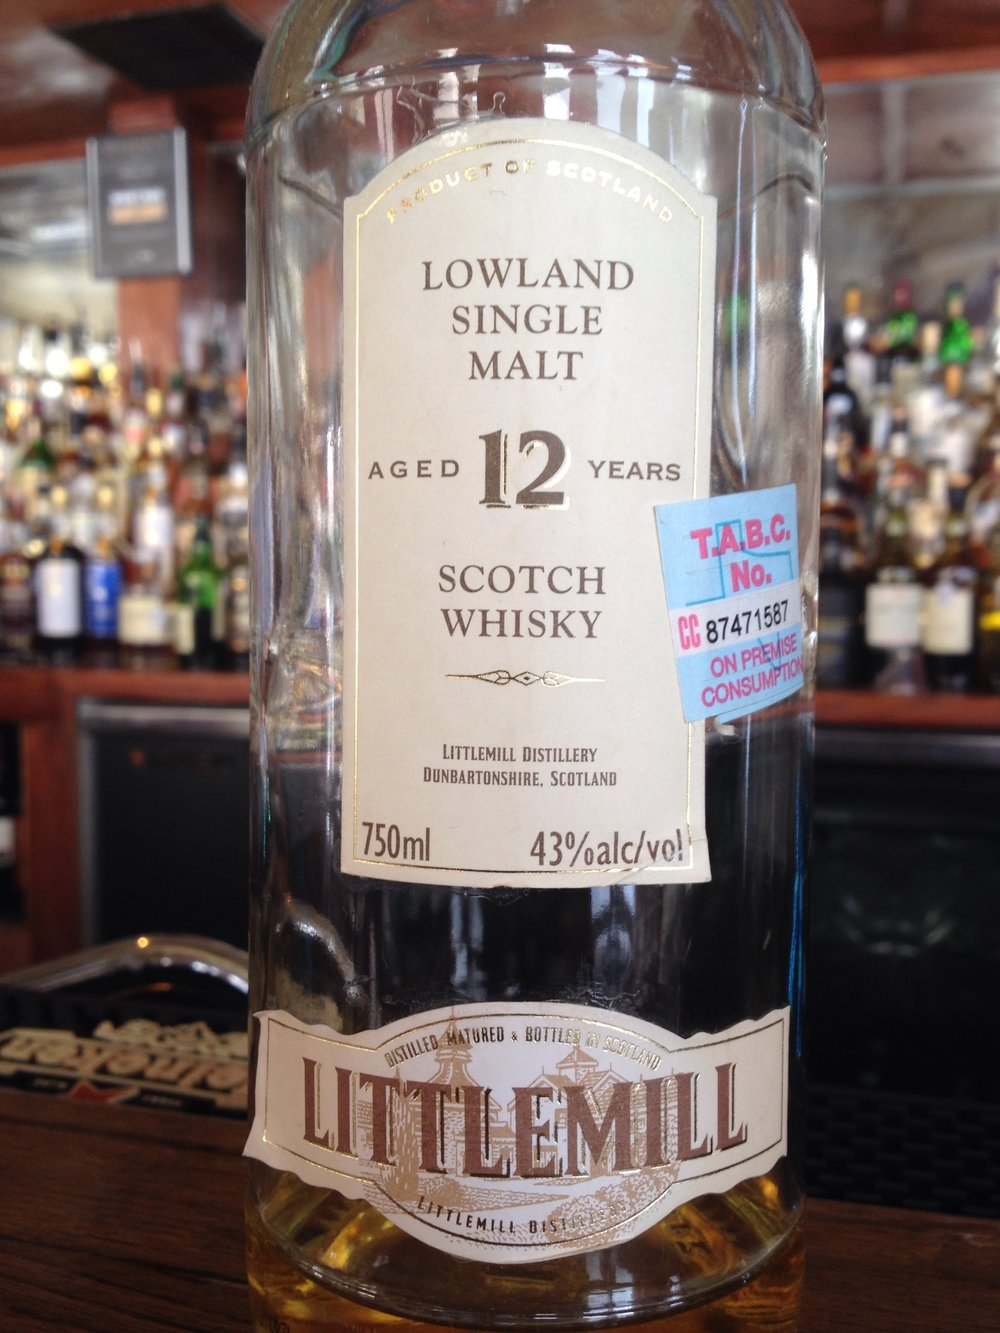 12 Year Old | 43% ABV - Distillery | Littlemill